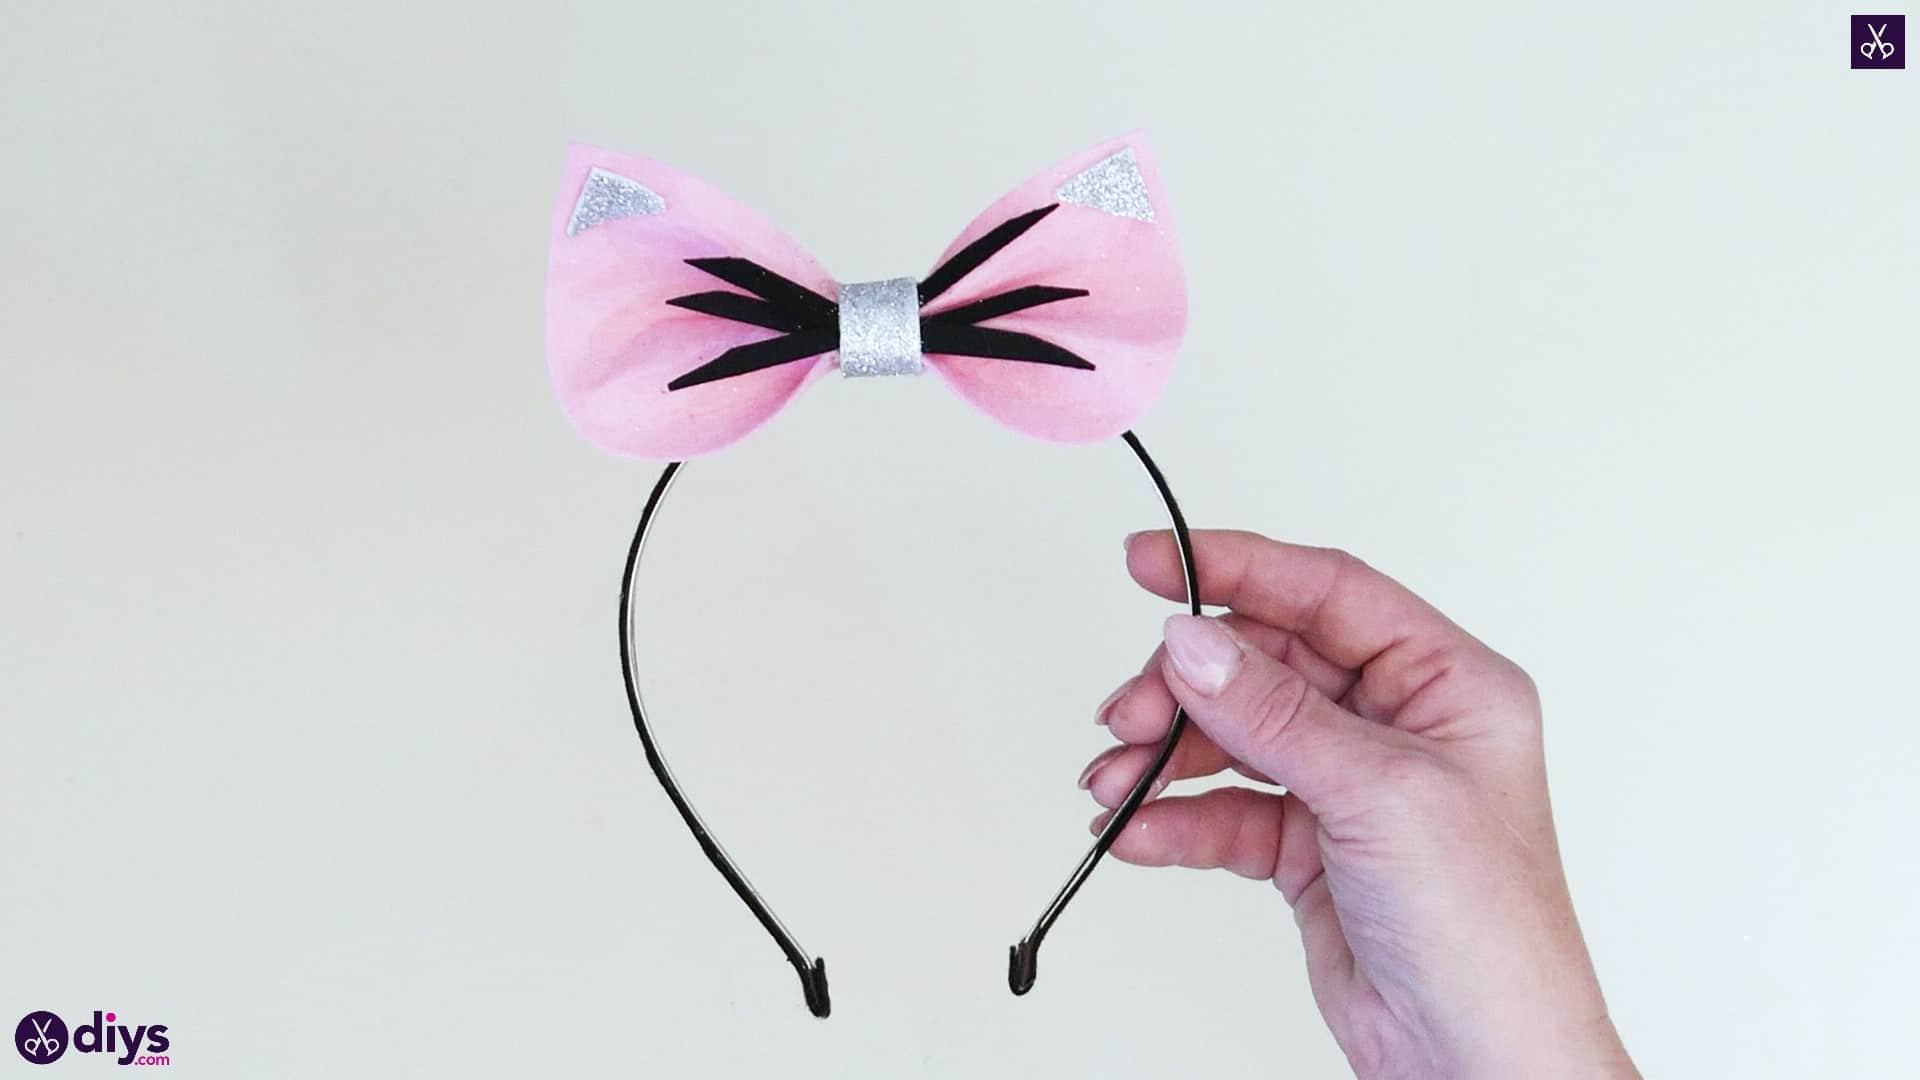 Diy cat ears headband step 10b